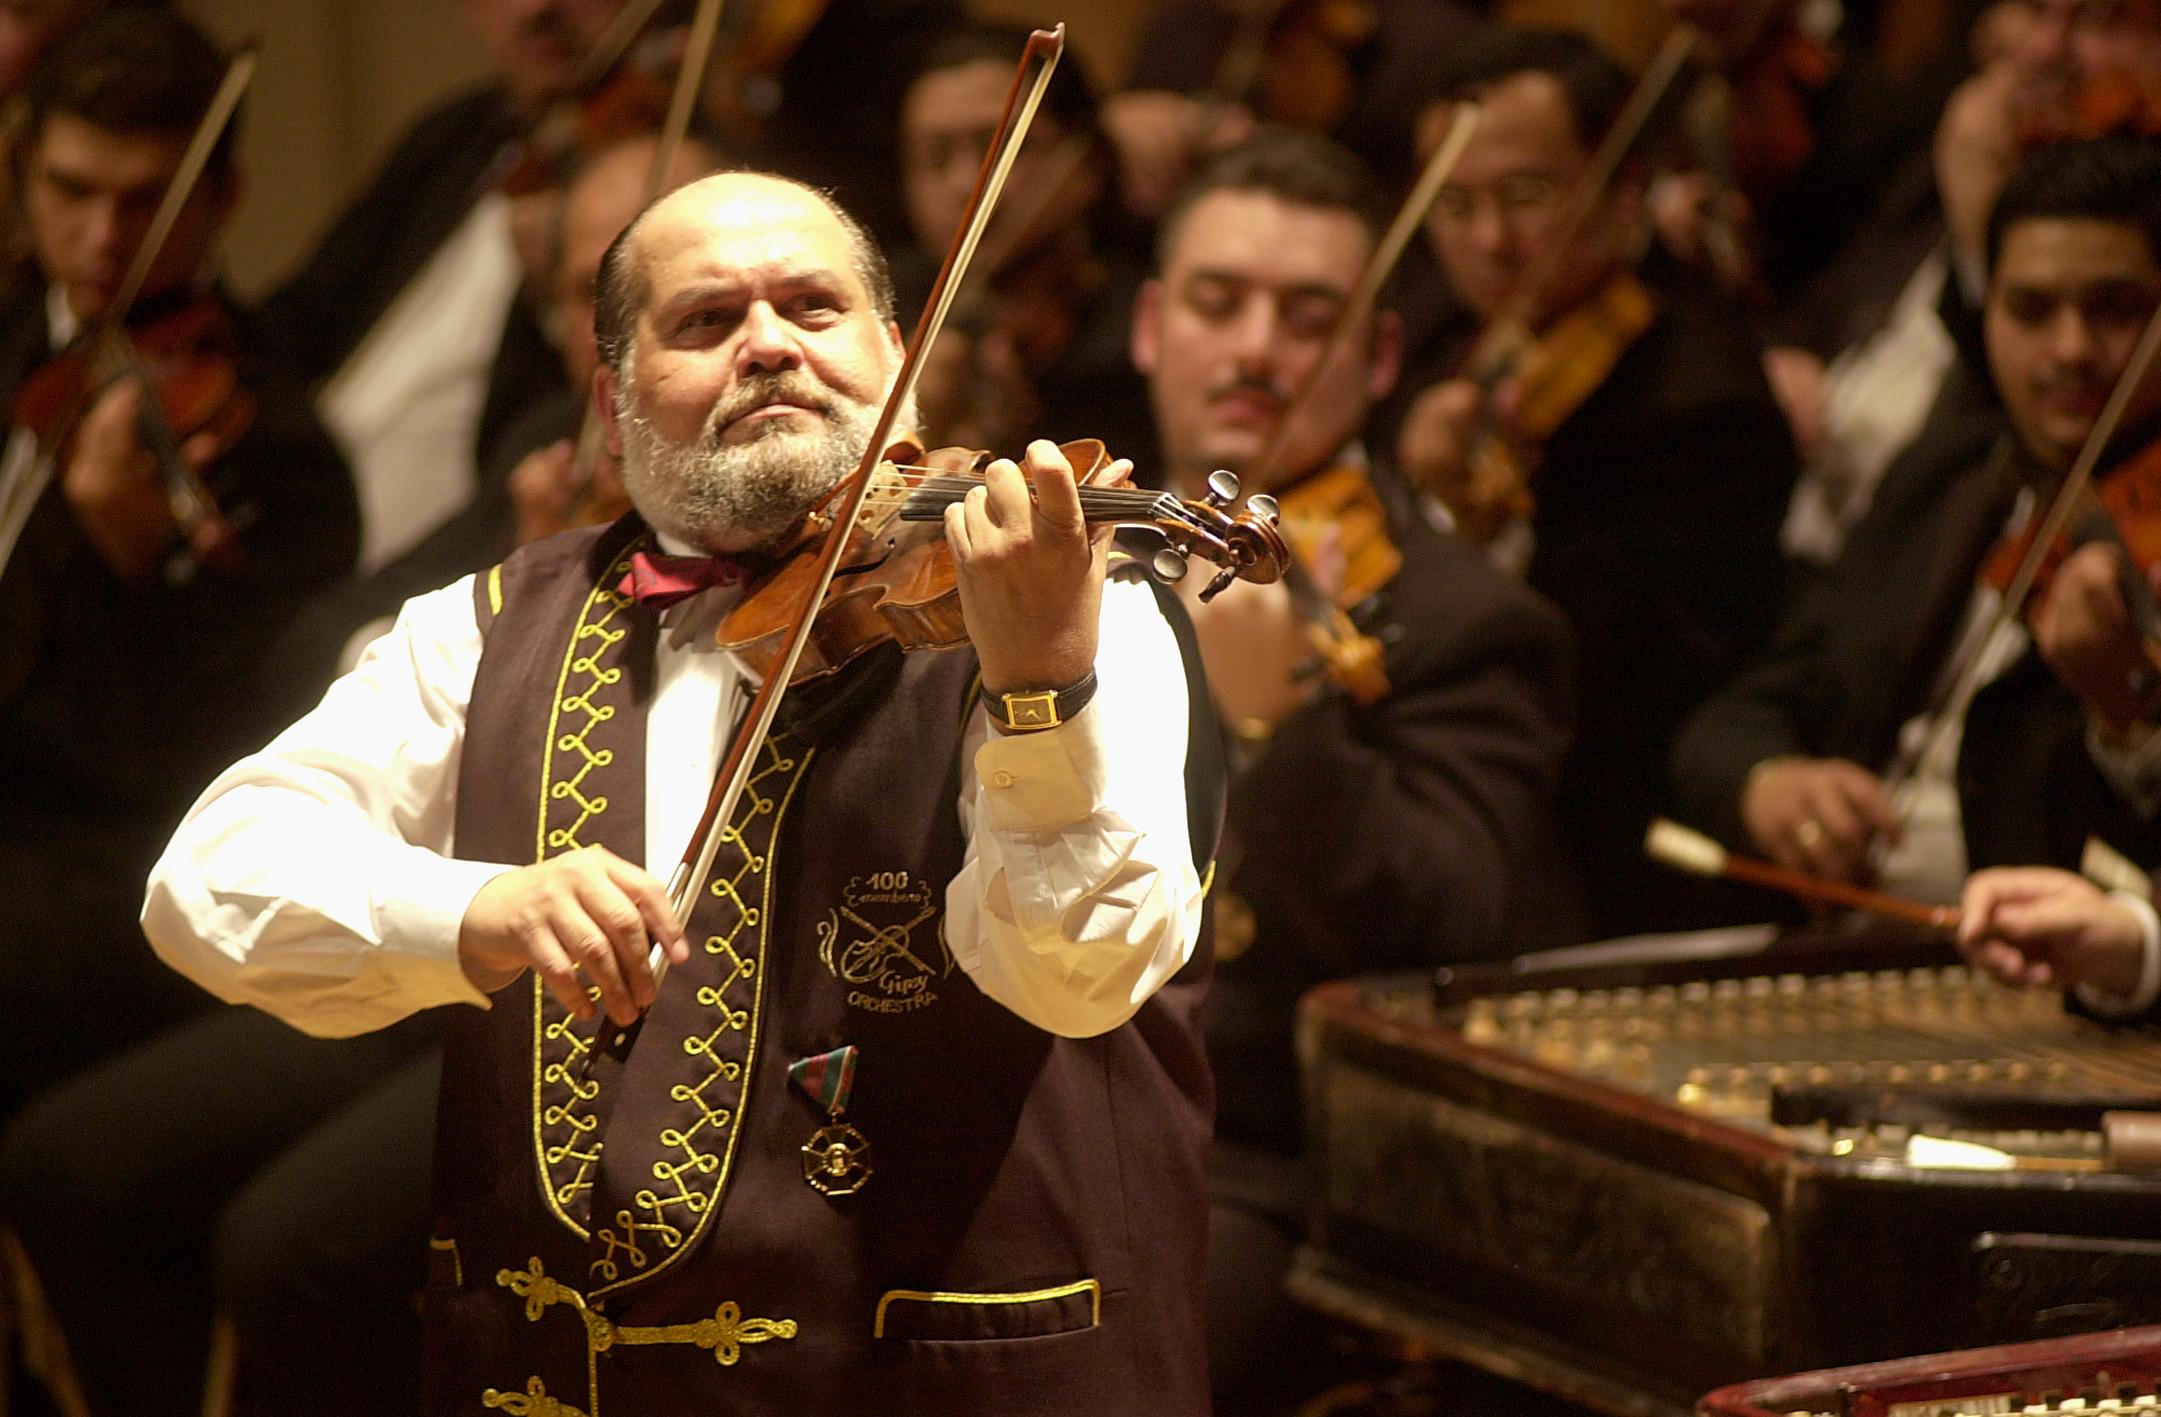 Осенний салон искусств в Пловдиве http://travelcalendar.ru/wp-content/uploads/2015/07/100-Gypsy-Violins-Brussels...pher-Alain-Dereymaeker.jpg